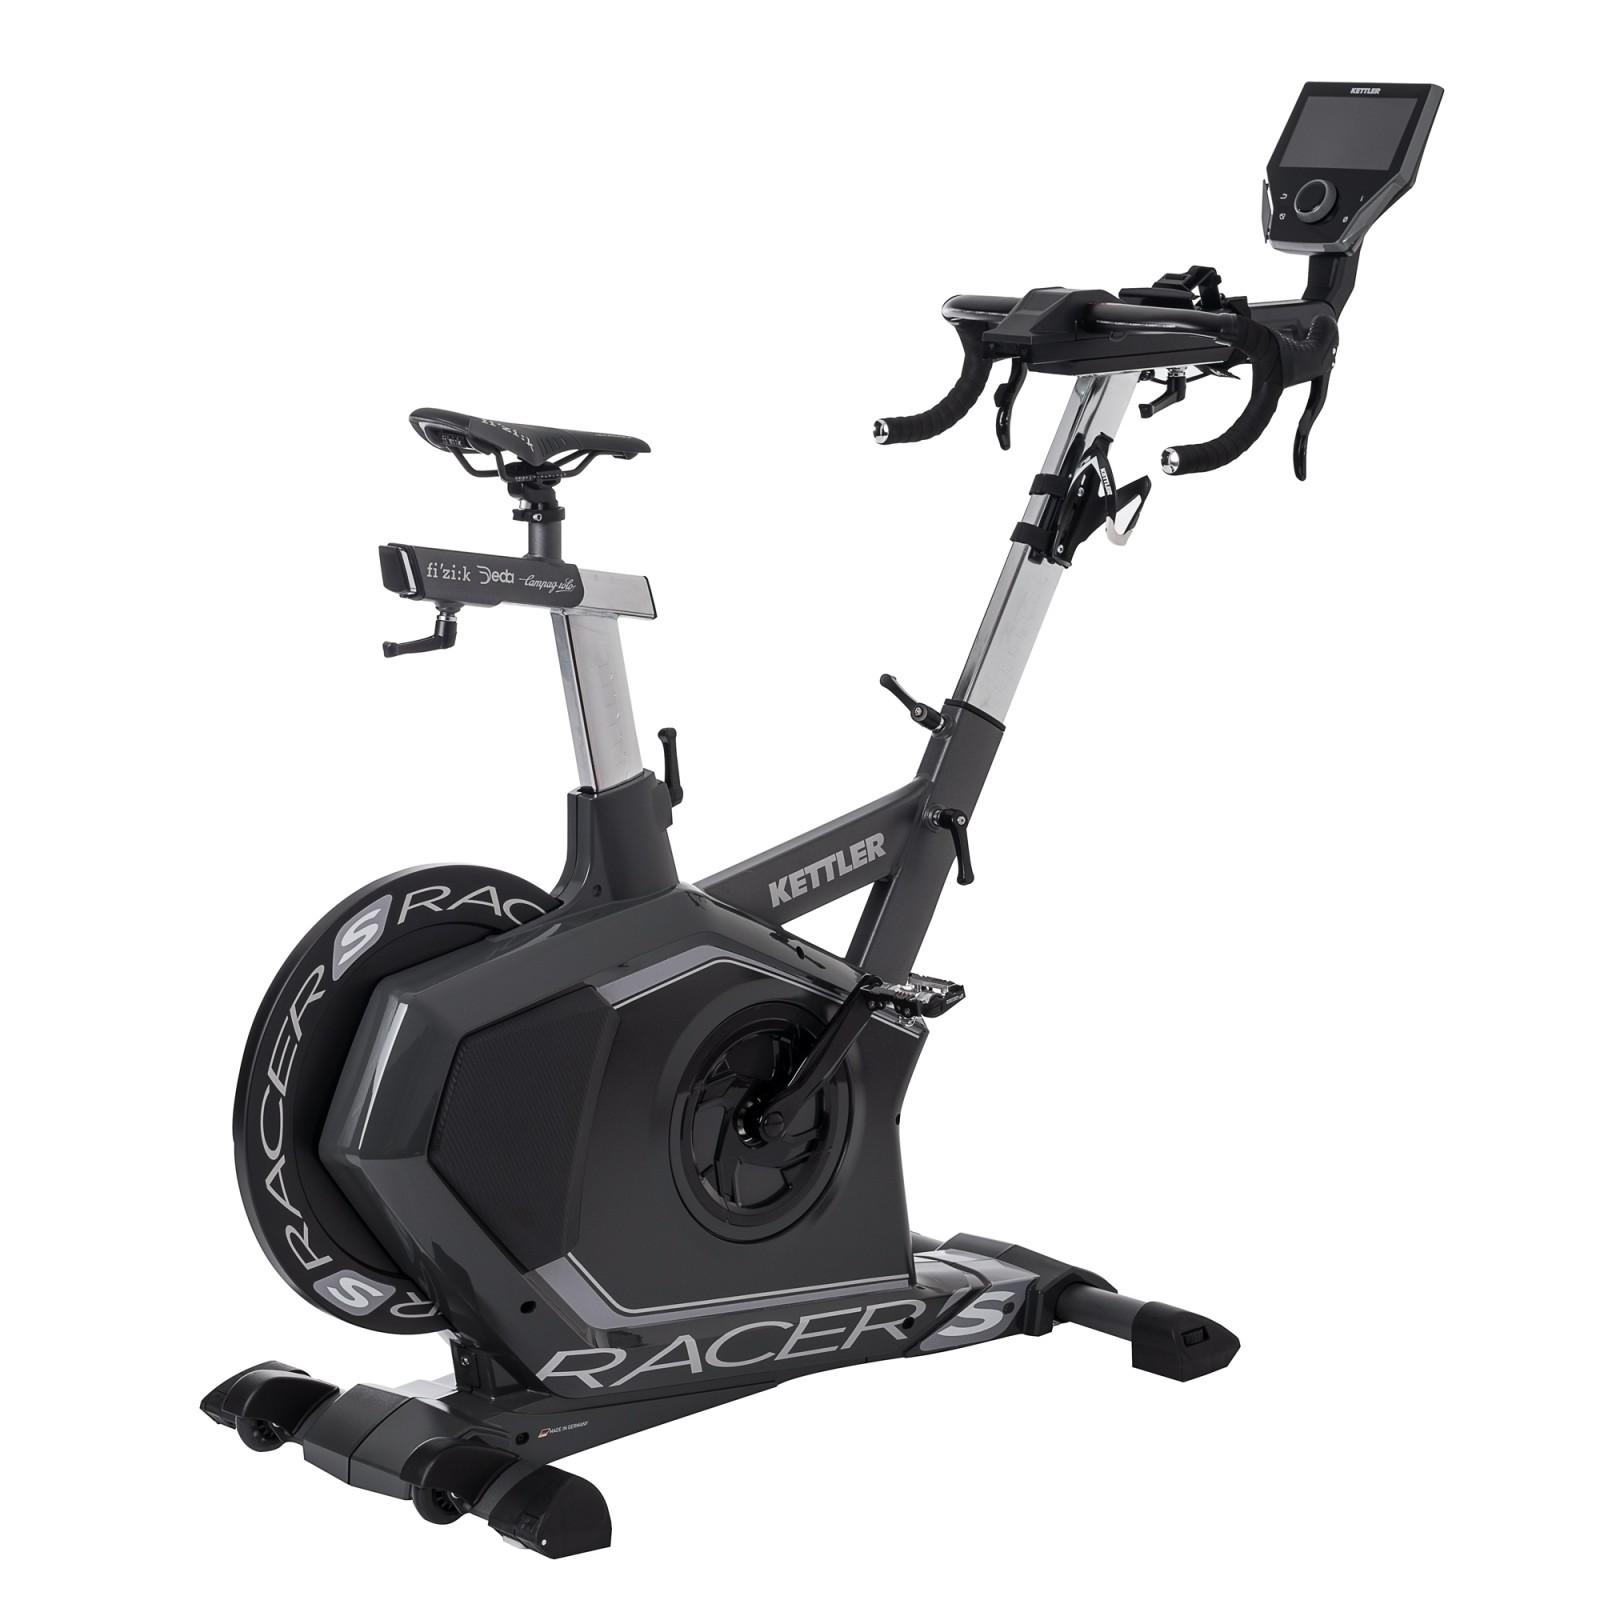 kettler indoor bike racer s exclusiv model osta 18 asiakasarvioinnissa fitshop. Black Bedroom Furniture Sets. Home Design Ideas